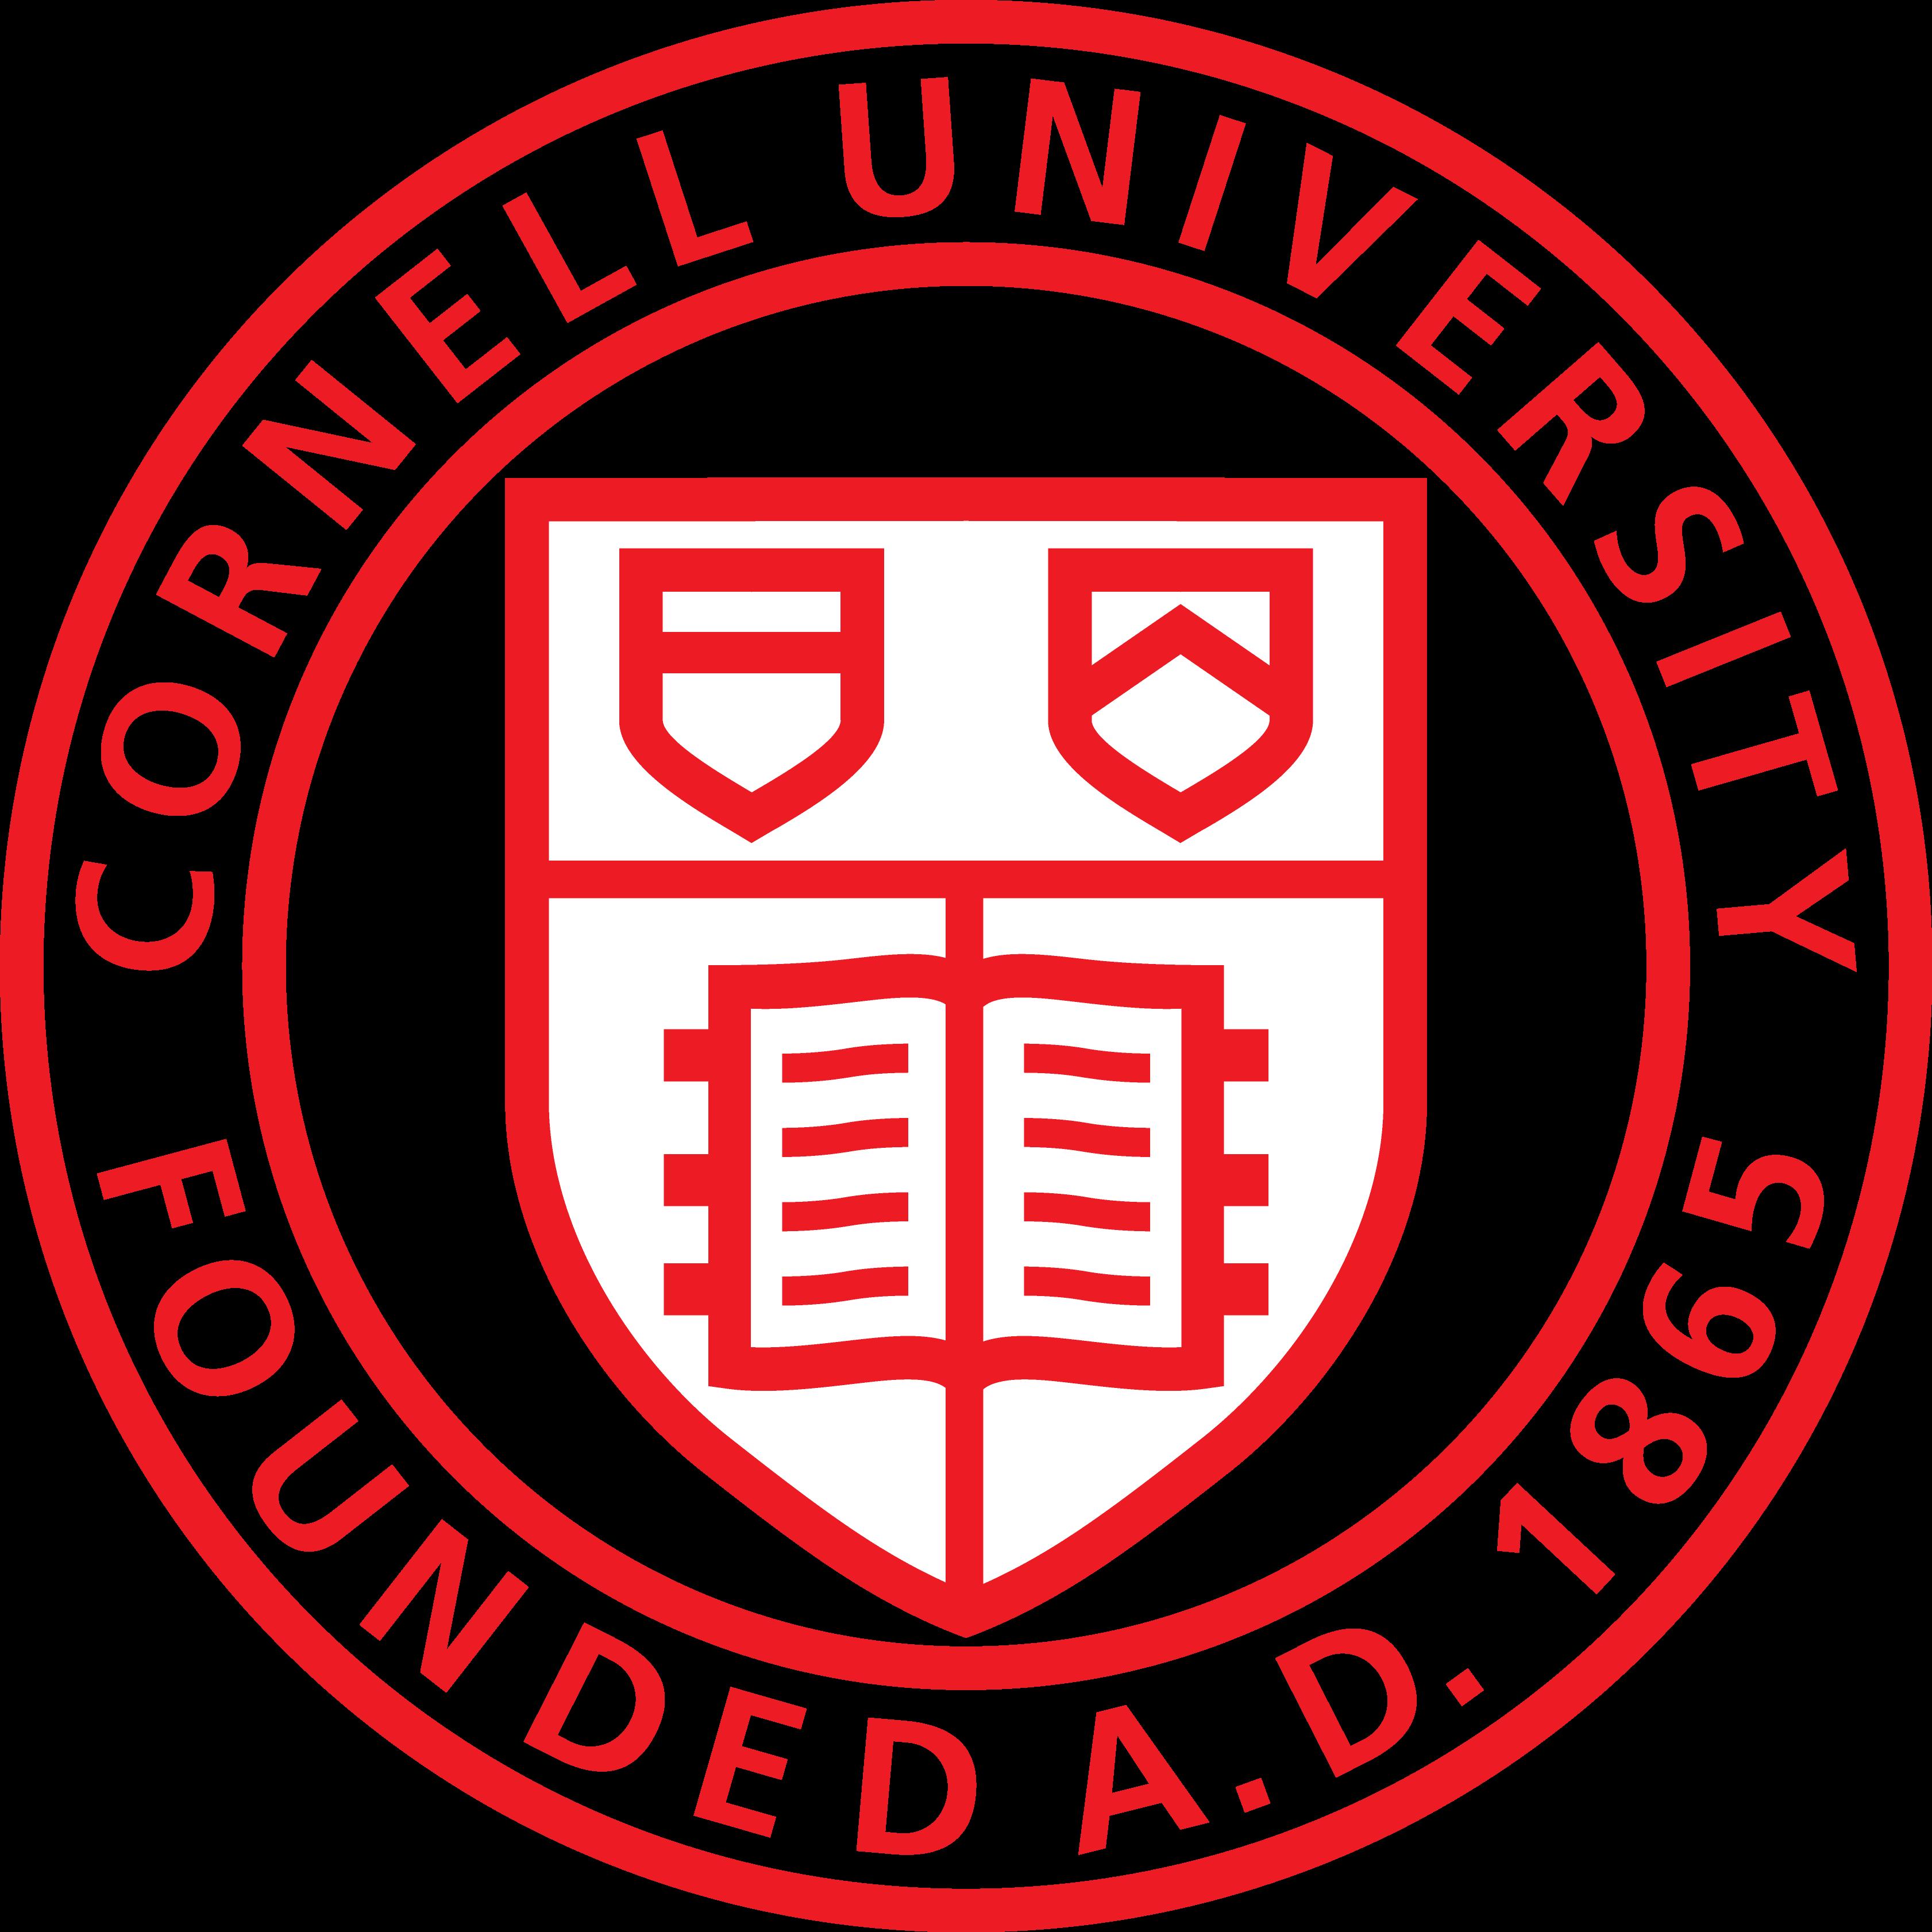 Cornell University Africana, Founde, Relogios